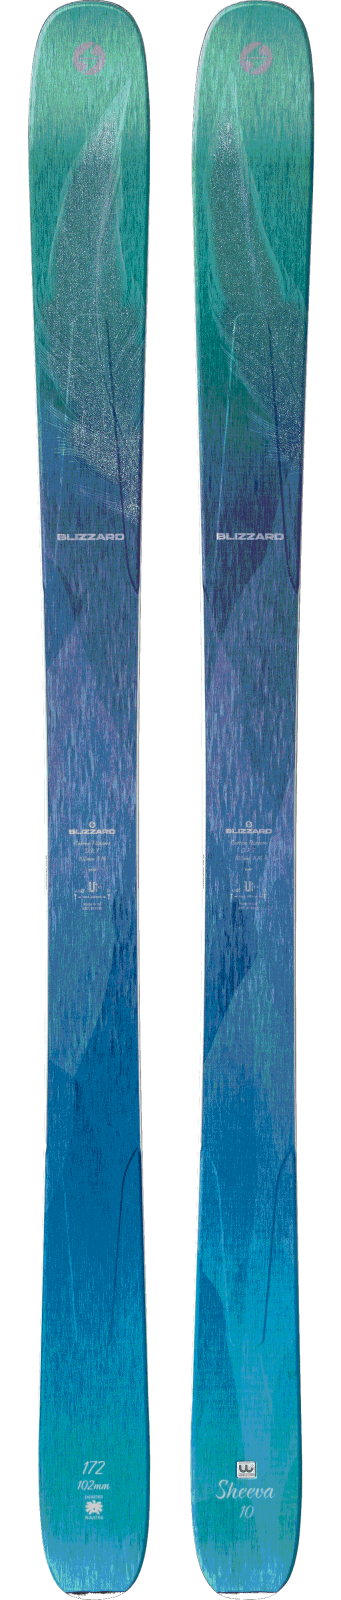 Blizzard Sheeva 10 Skis 2019